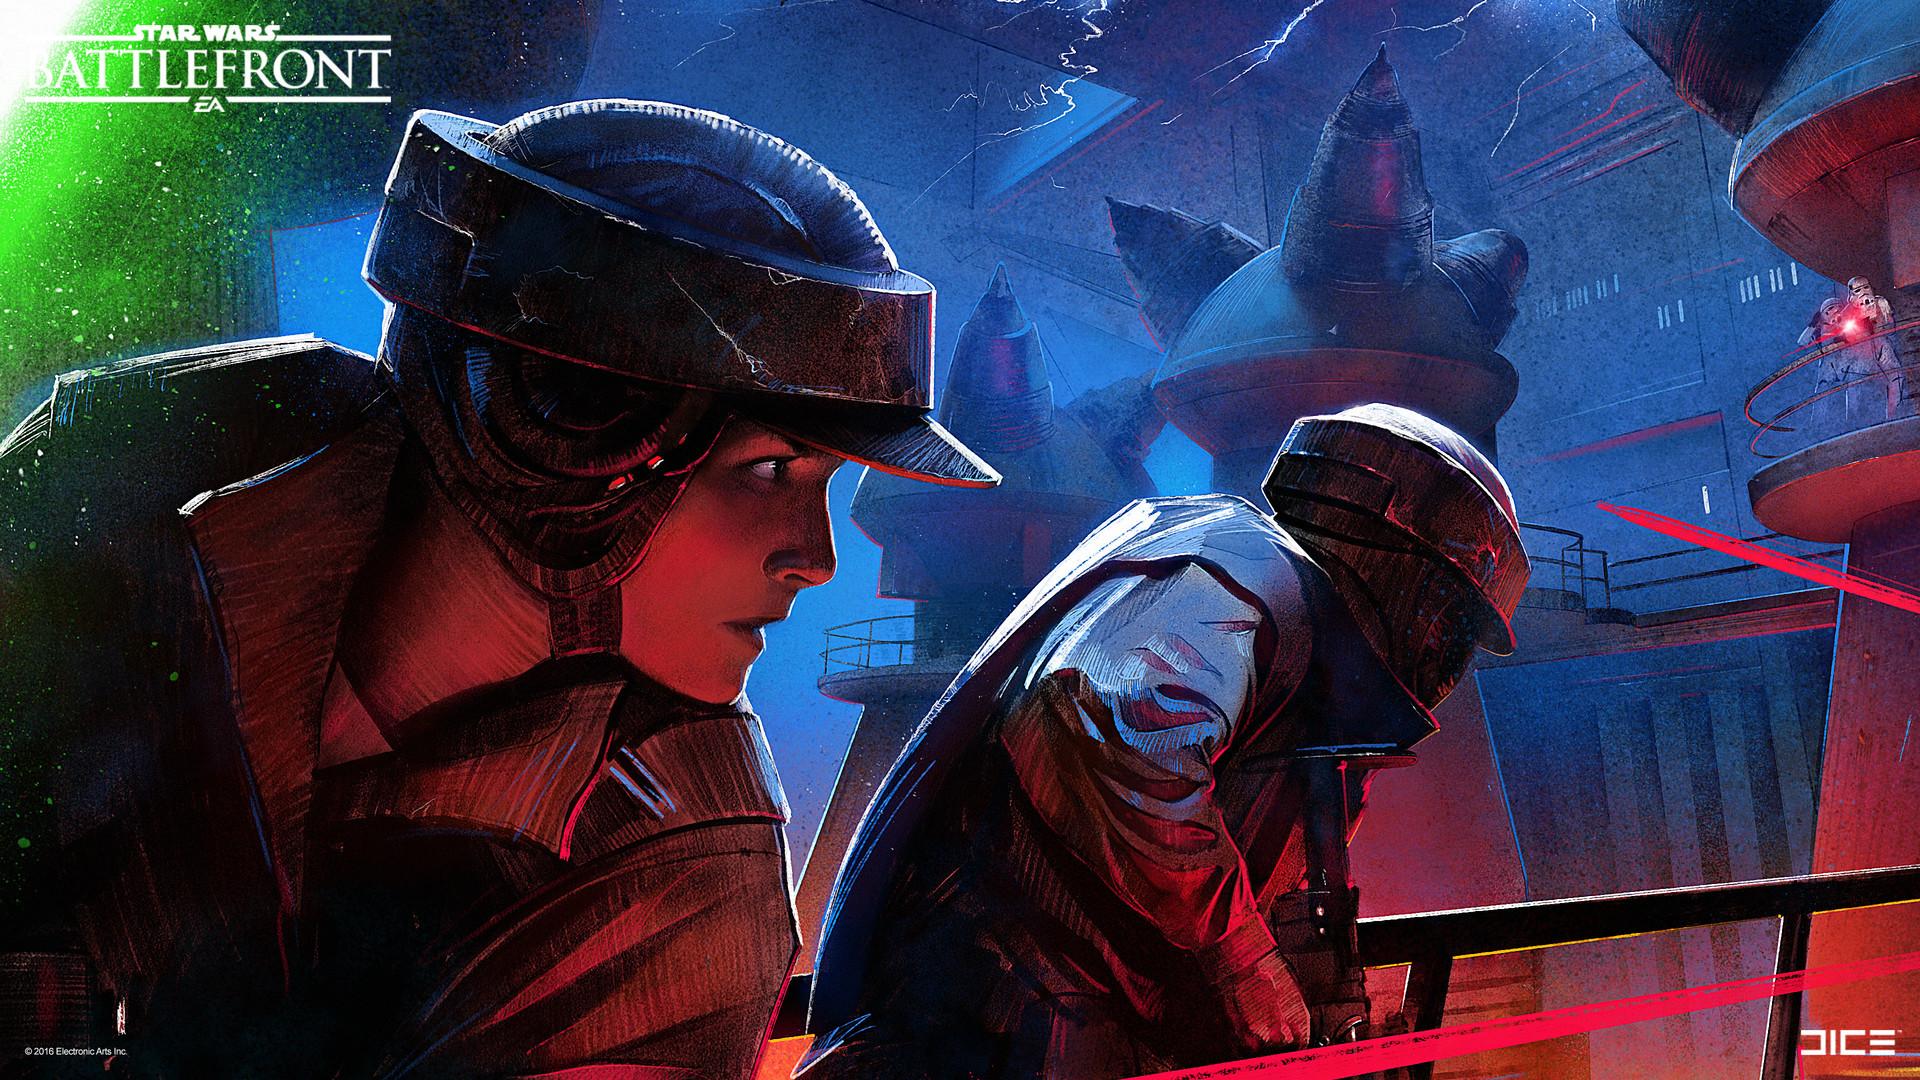 The Art of Star Wars Battlefront by Anton Grandert